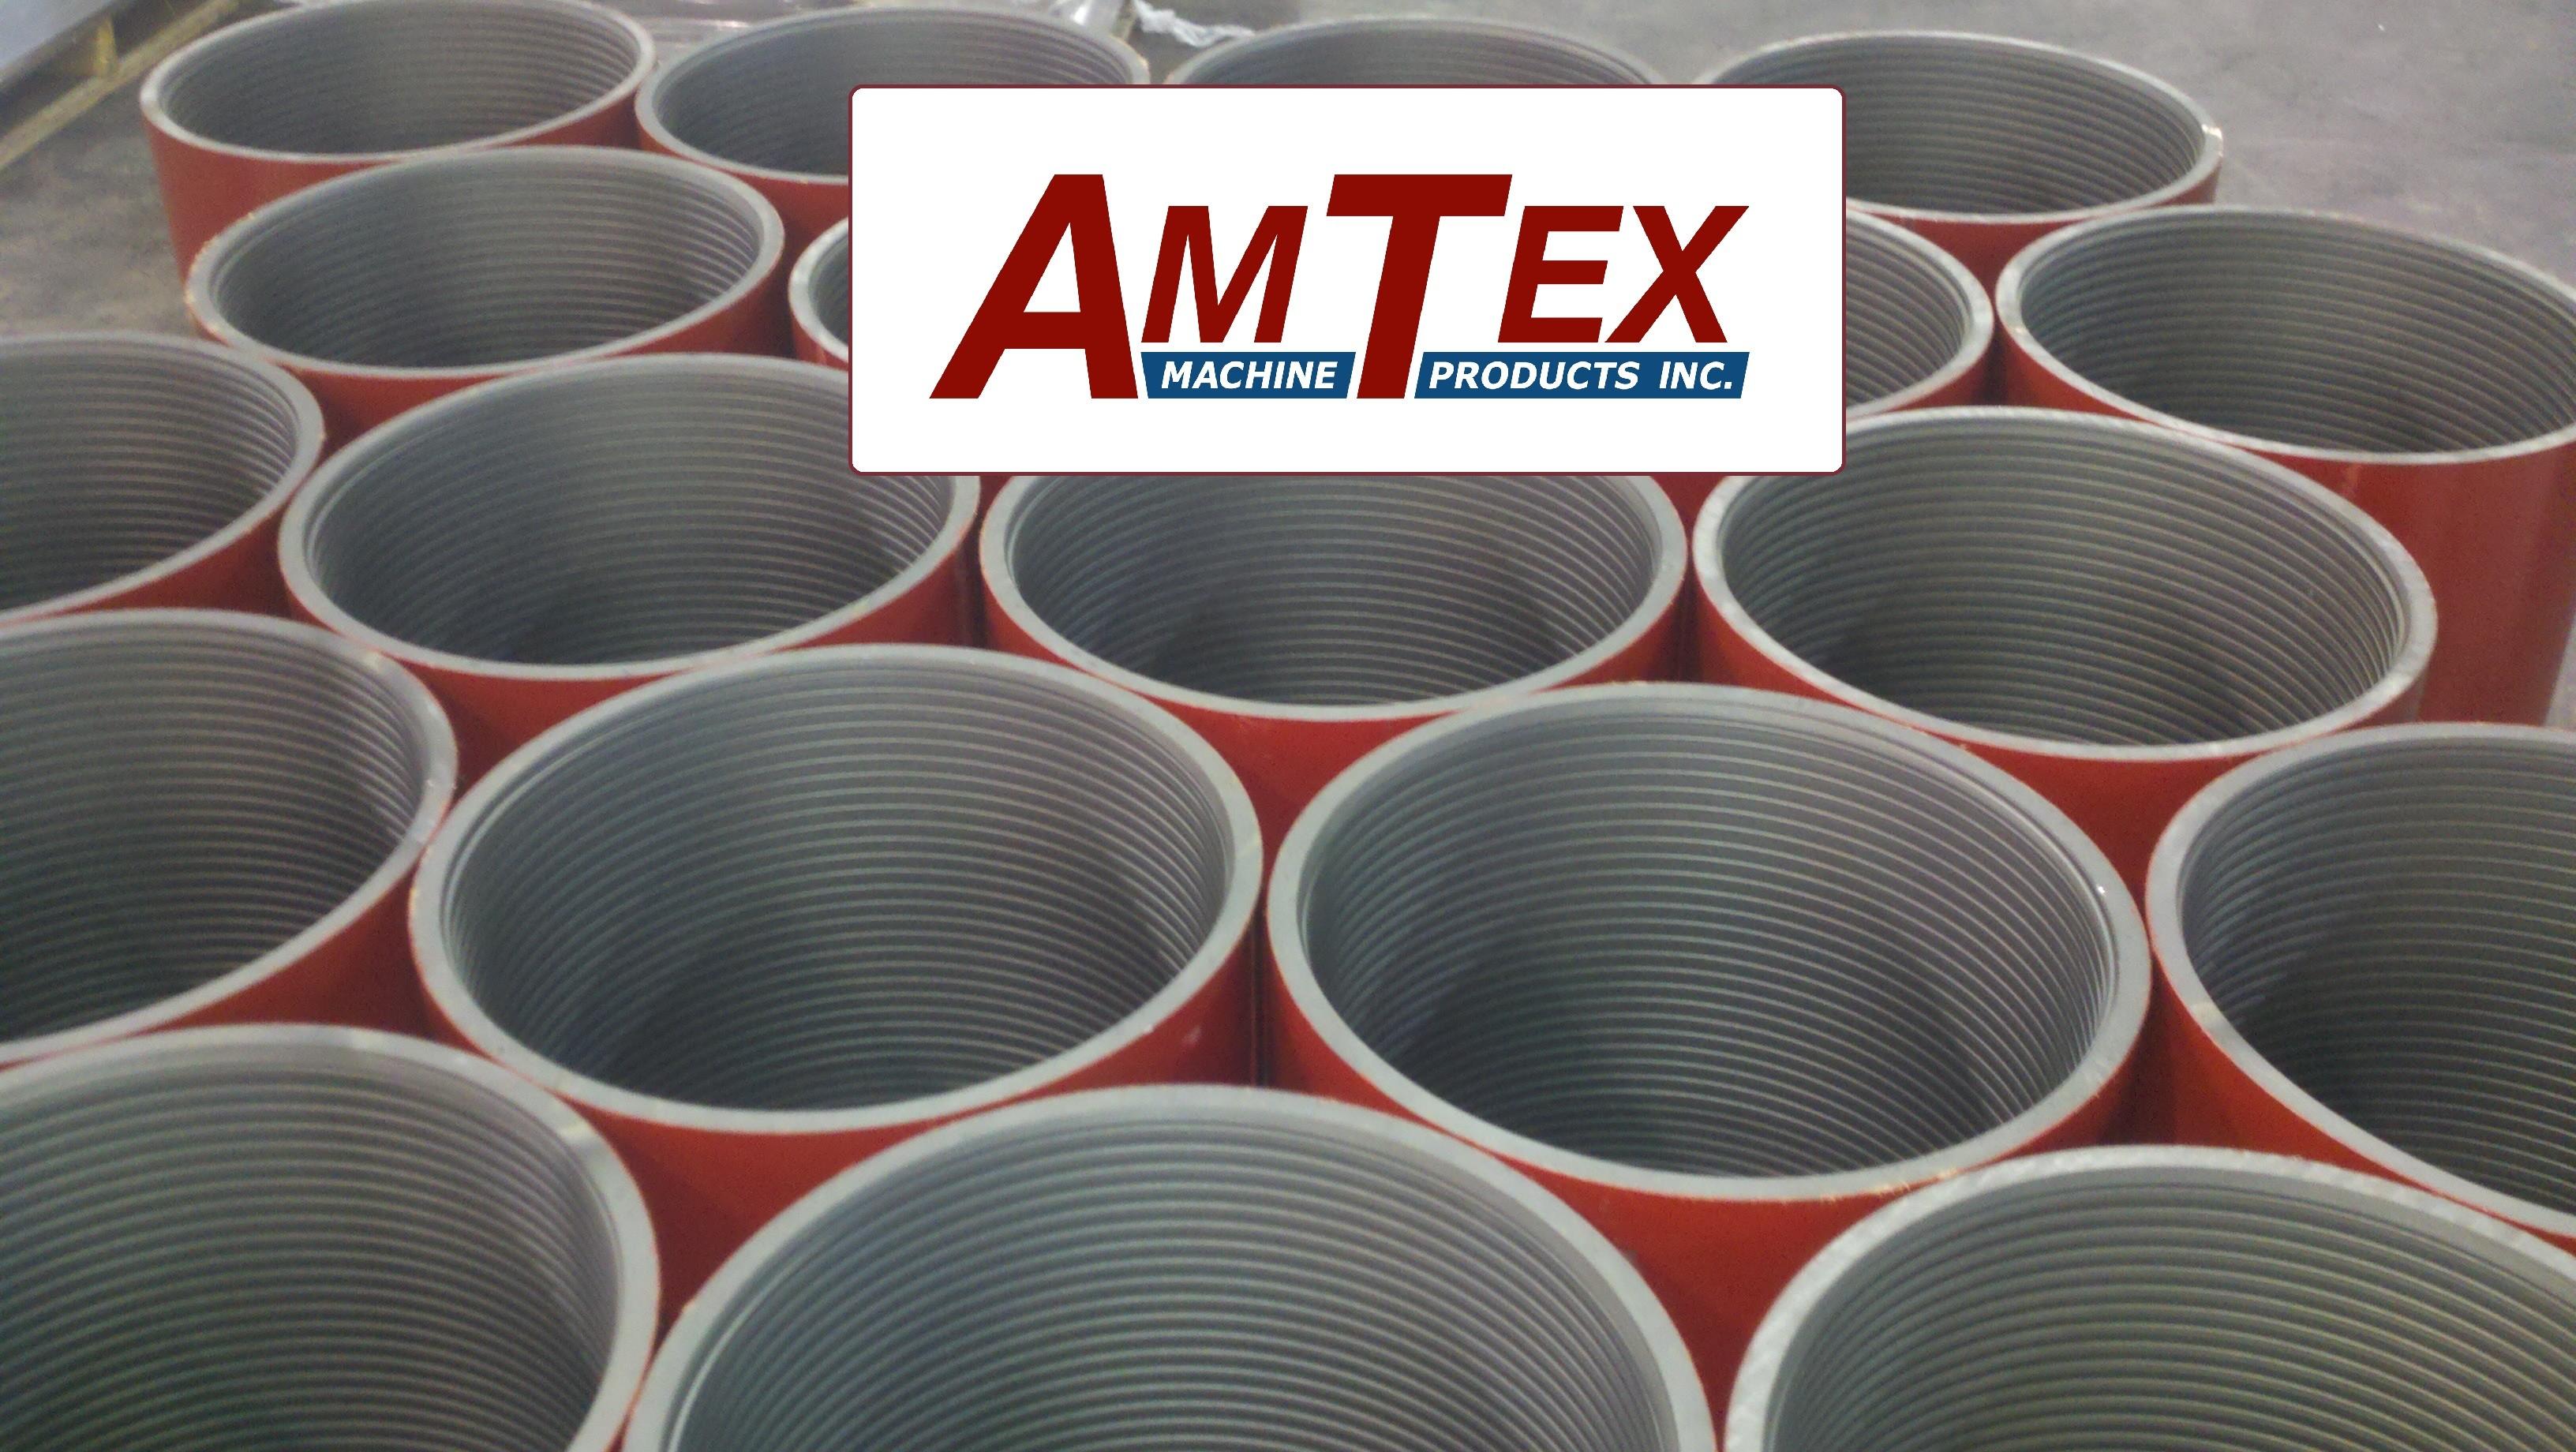 AmTex Machine Products | LinkedIn